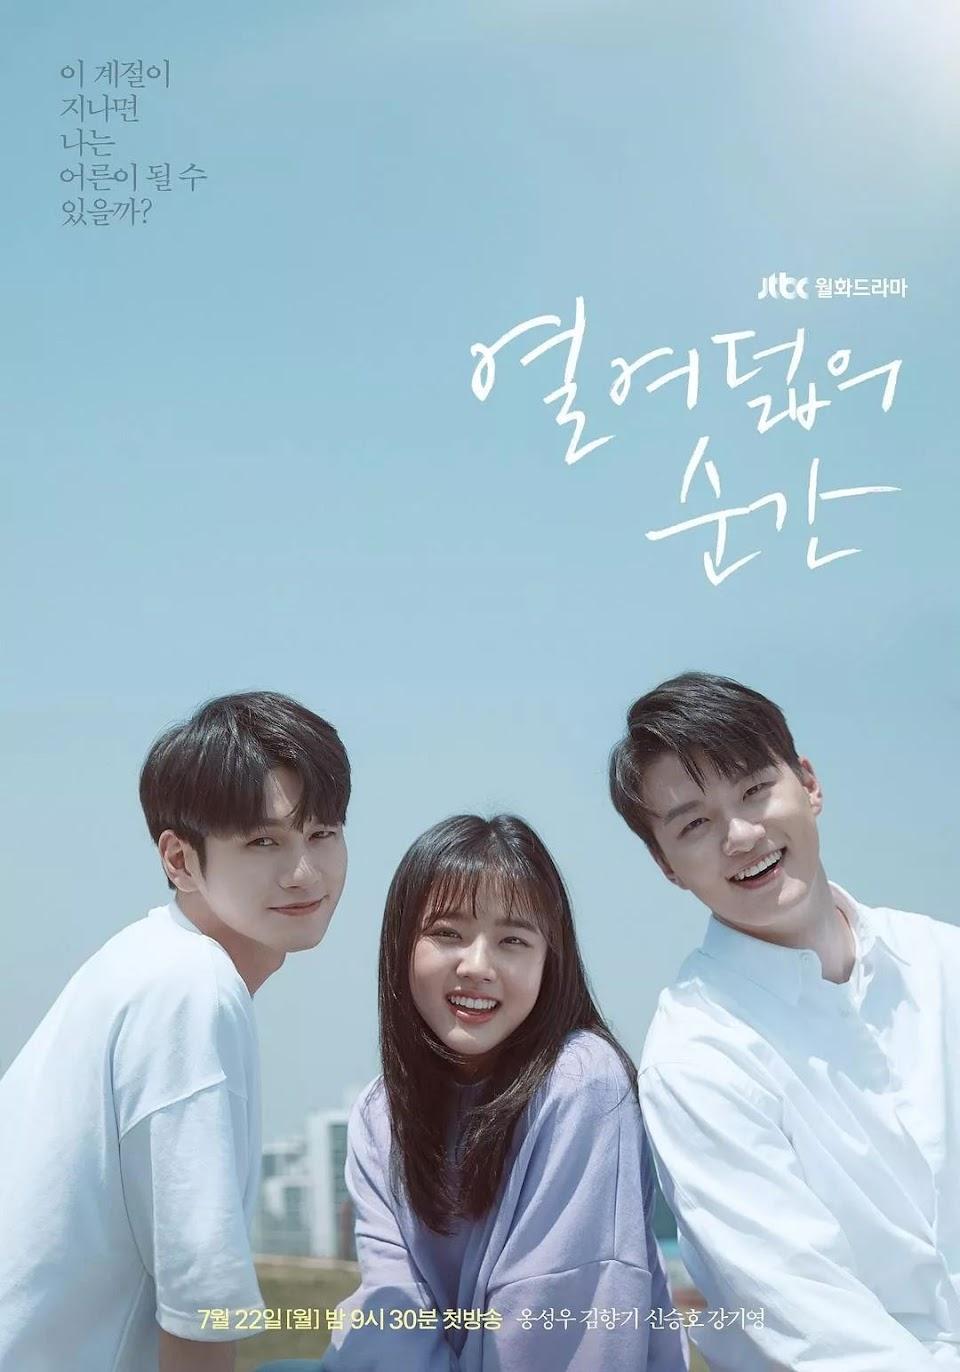 kim hyang gi ong sungwoo drama